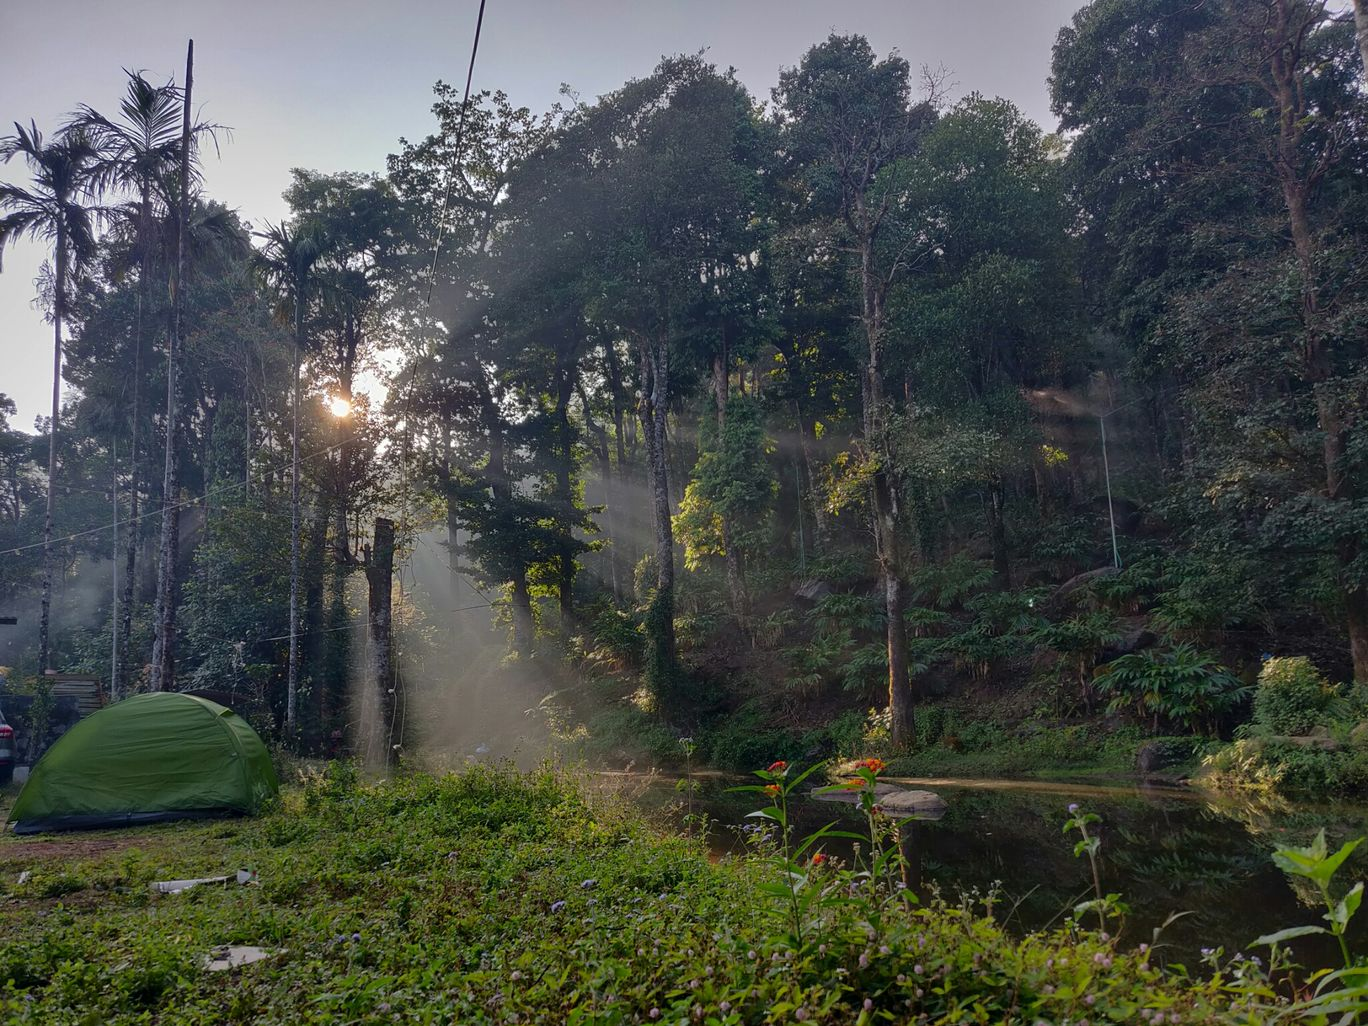 Photo of Tentgram 900 Kandi By Dilhara Dhillu